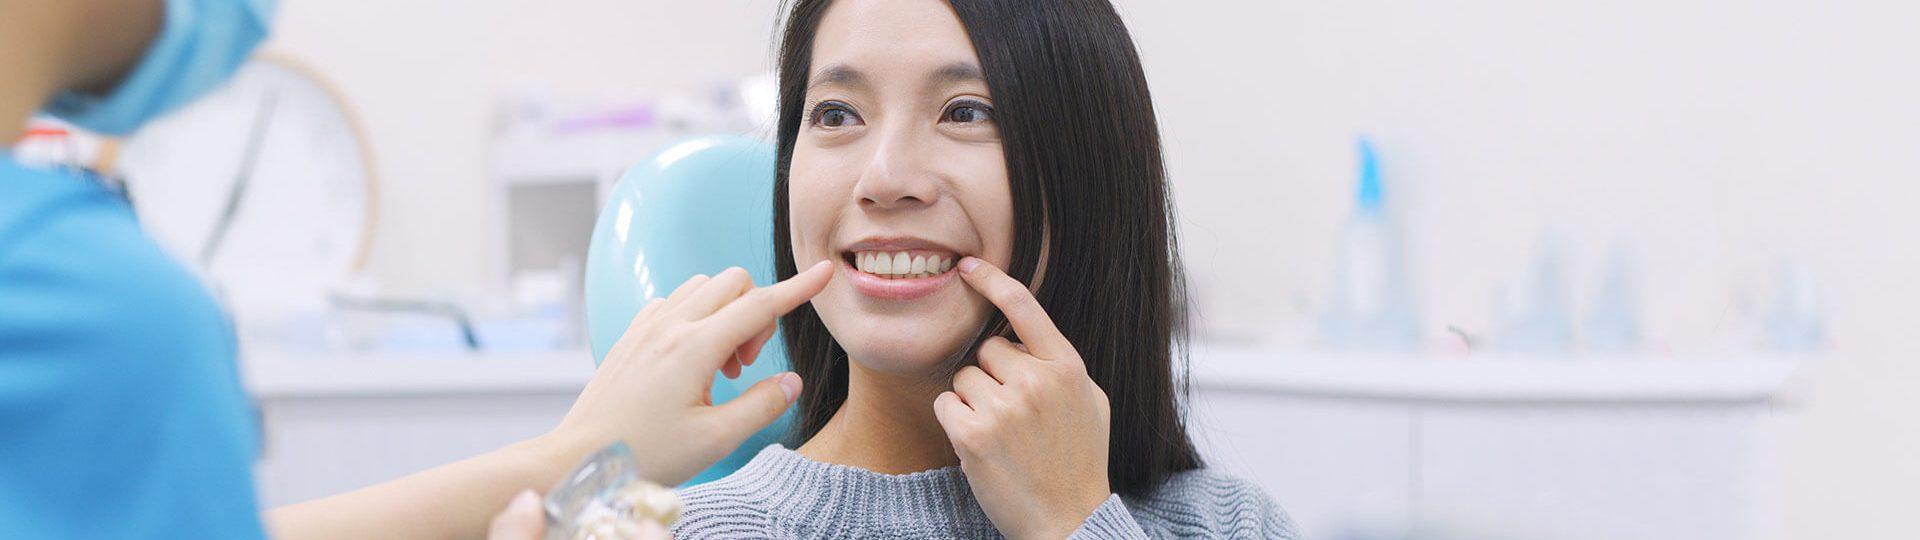 4 Ways Dental Veneers Could Change Your Life